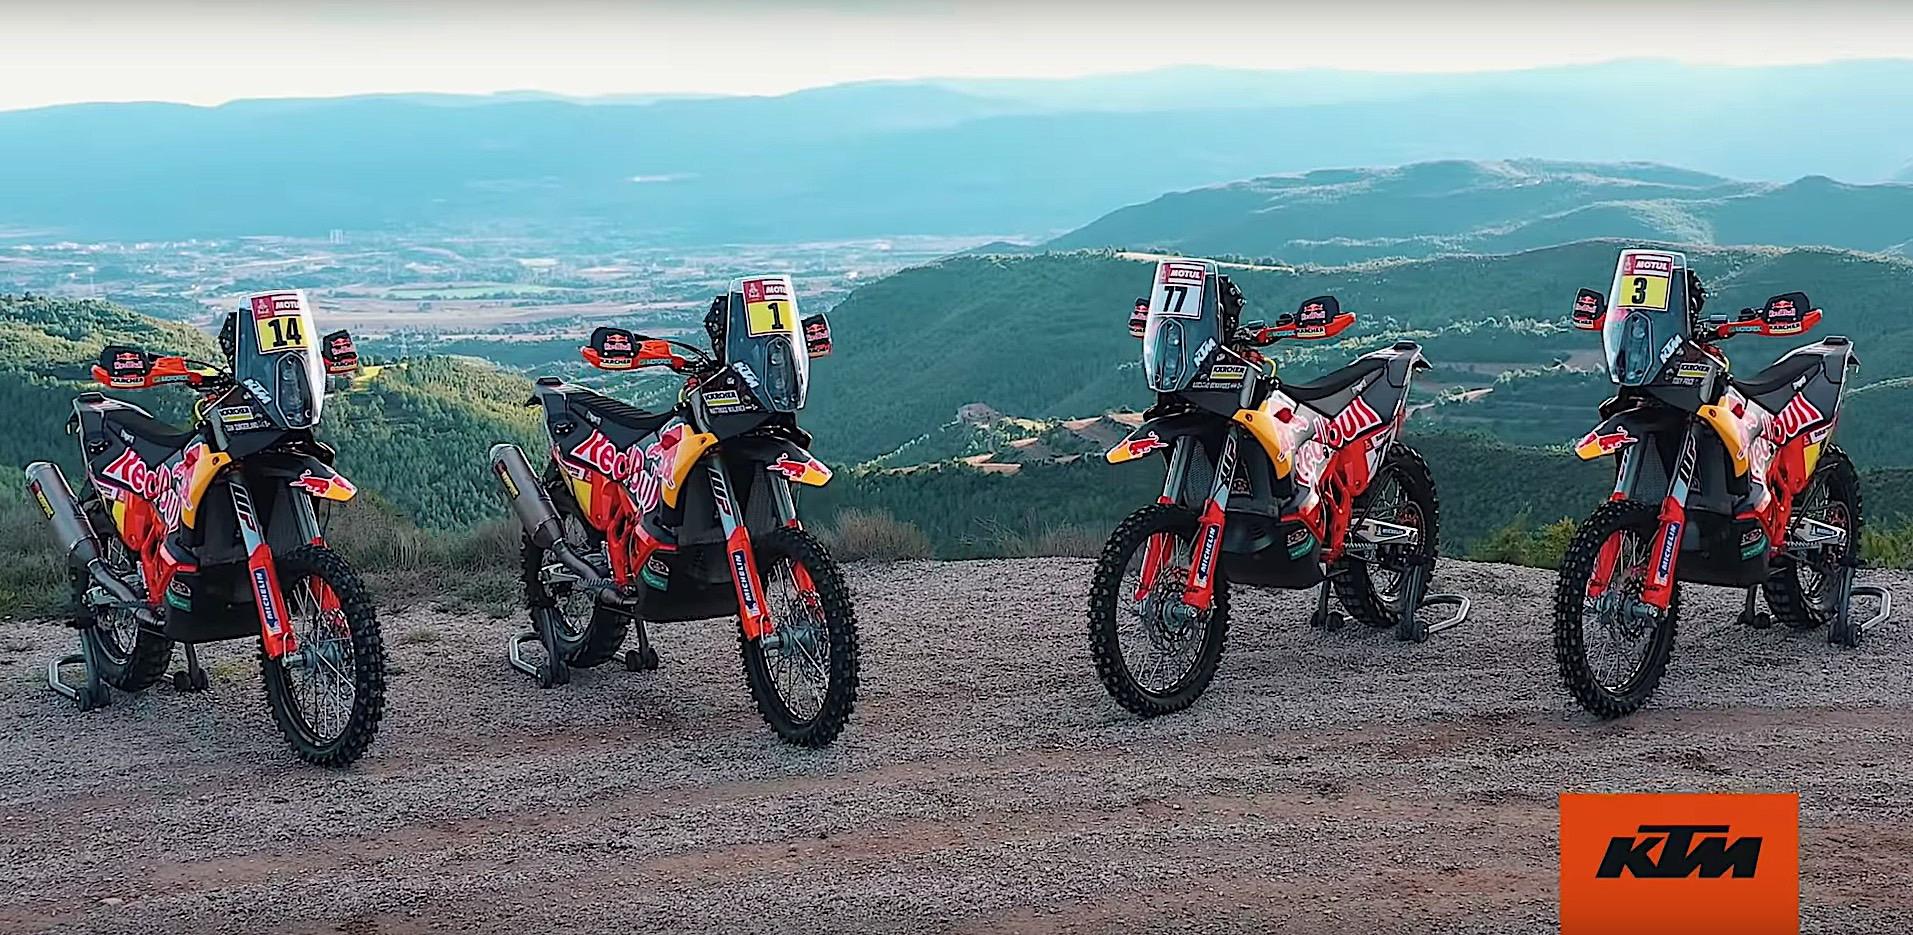 Red Bull KTM Factory Racing predstavio motocikl i postavu za Dakar reli 2019.